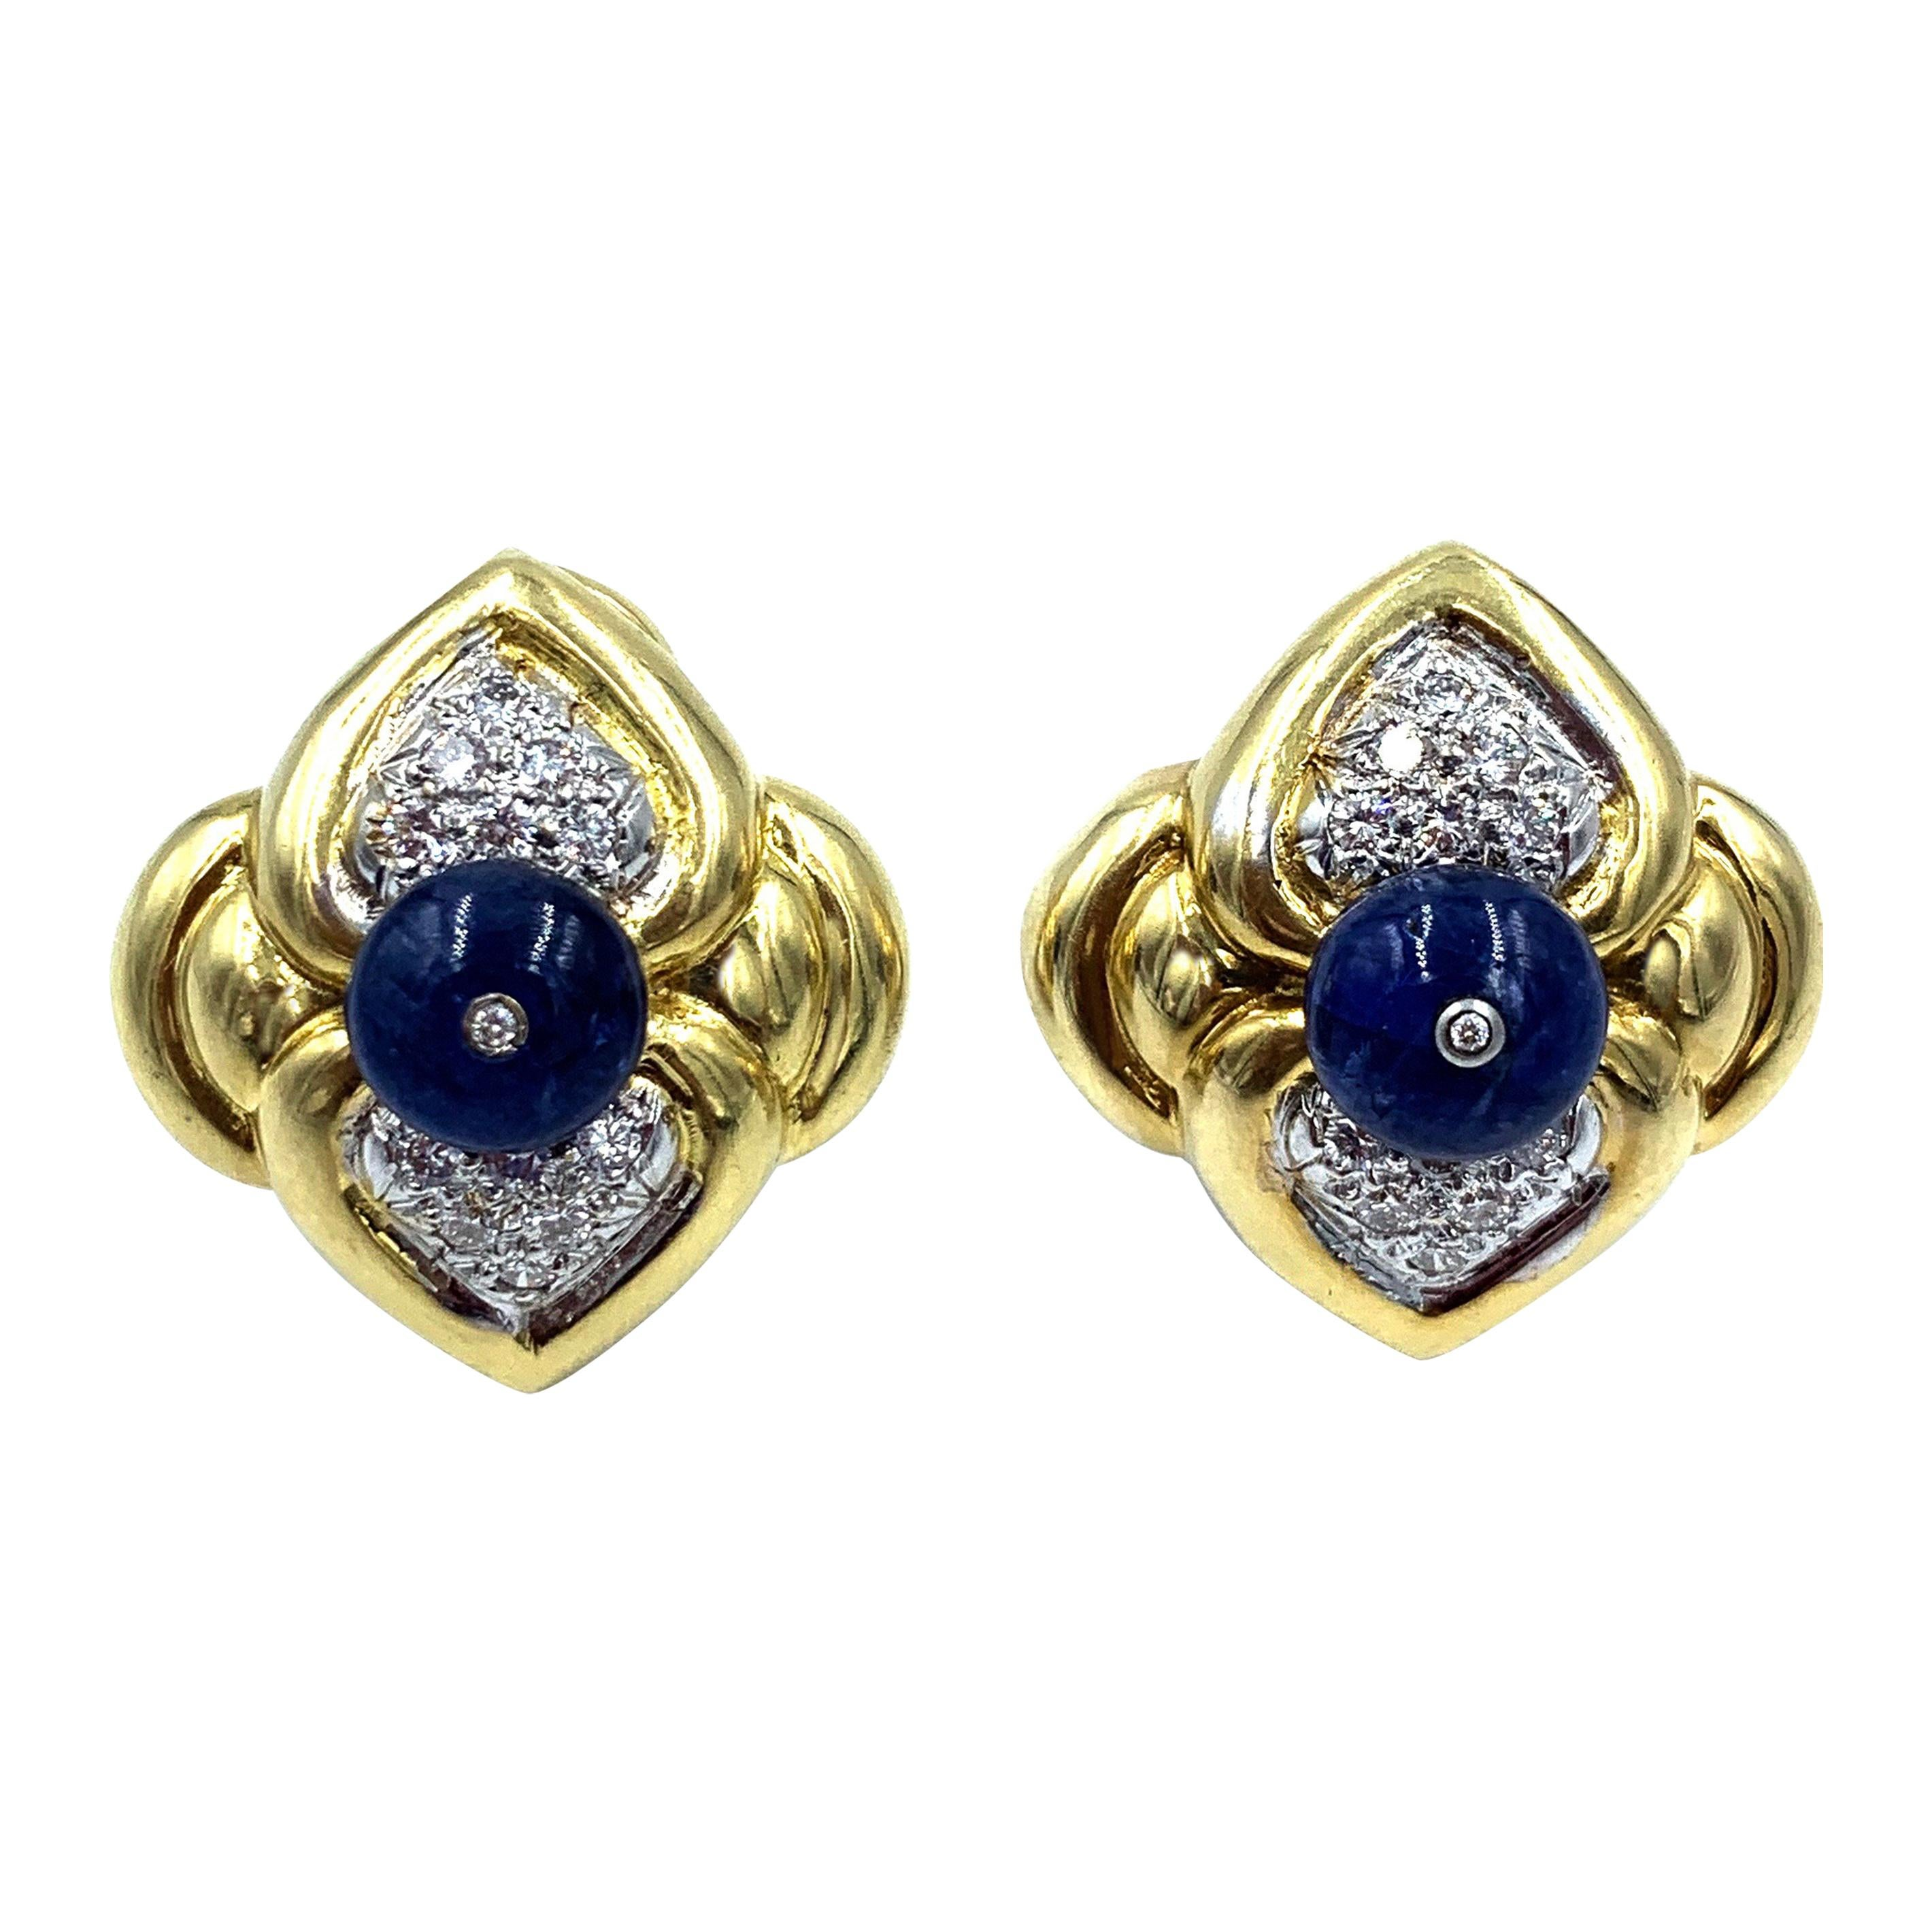 18 Karat Yellow Gold Cabochon Sapphire and Diamond Clip Earrings